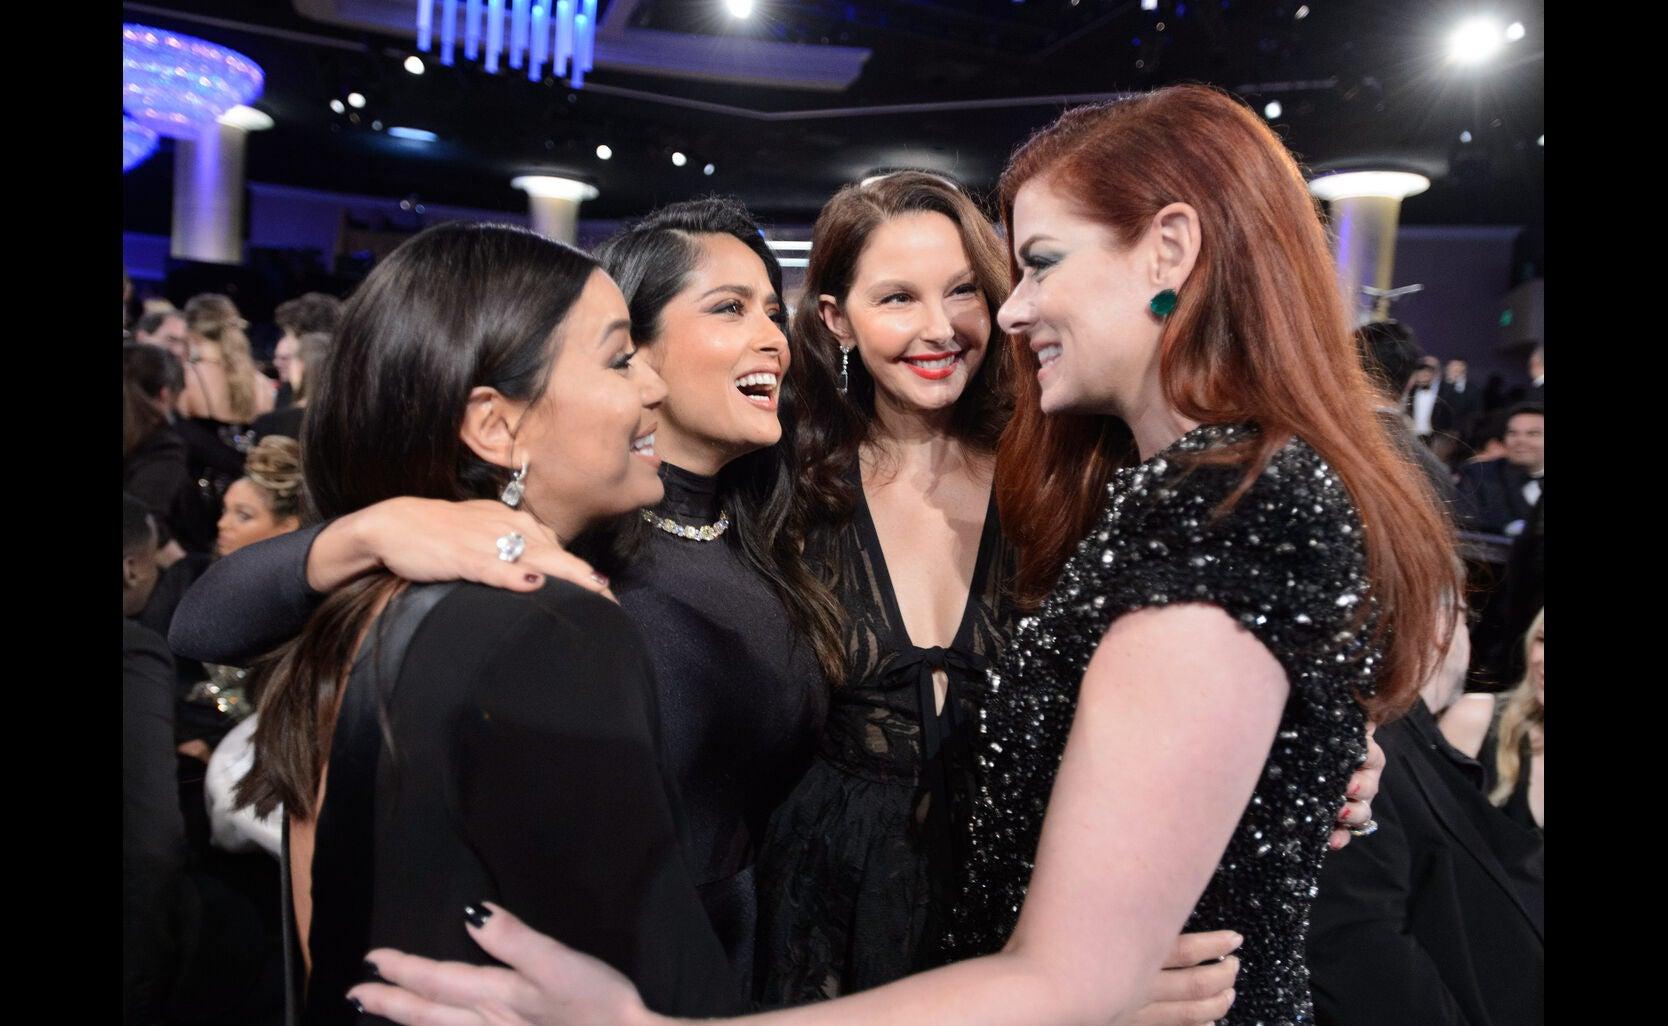 Eva Longoria, Salma Hayek, Ashley Judd and Debra Messing at the 2018 Golden Globes